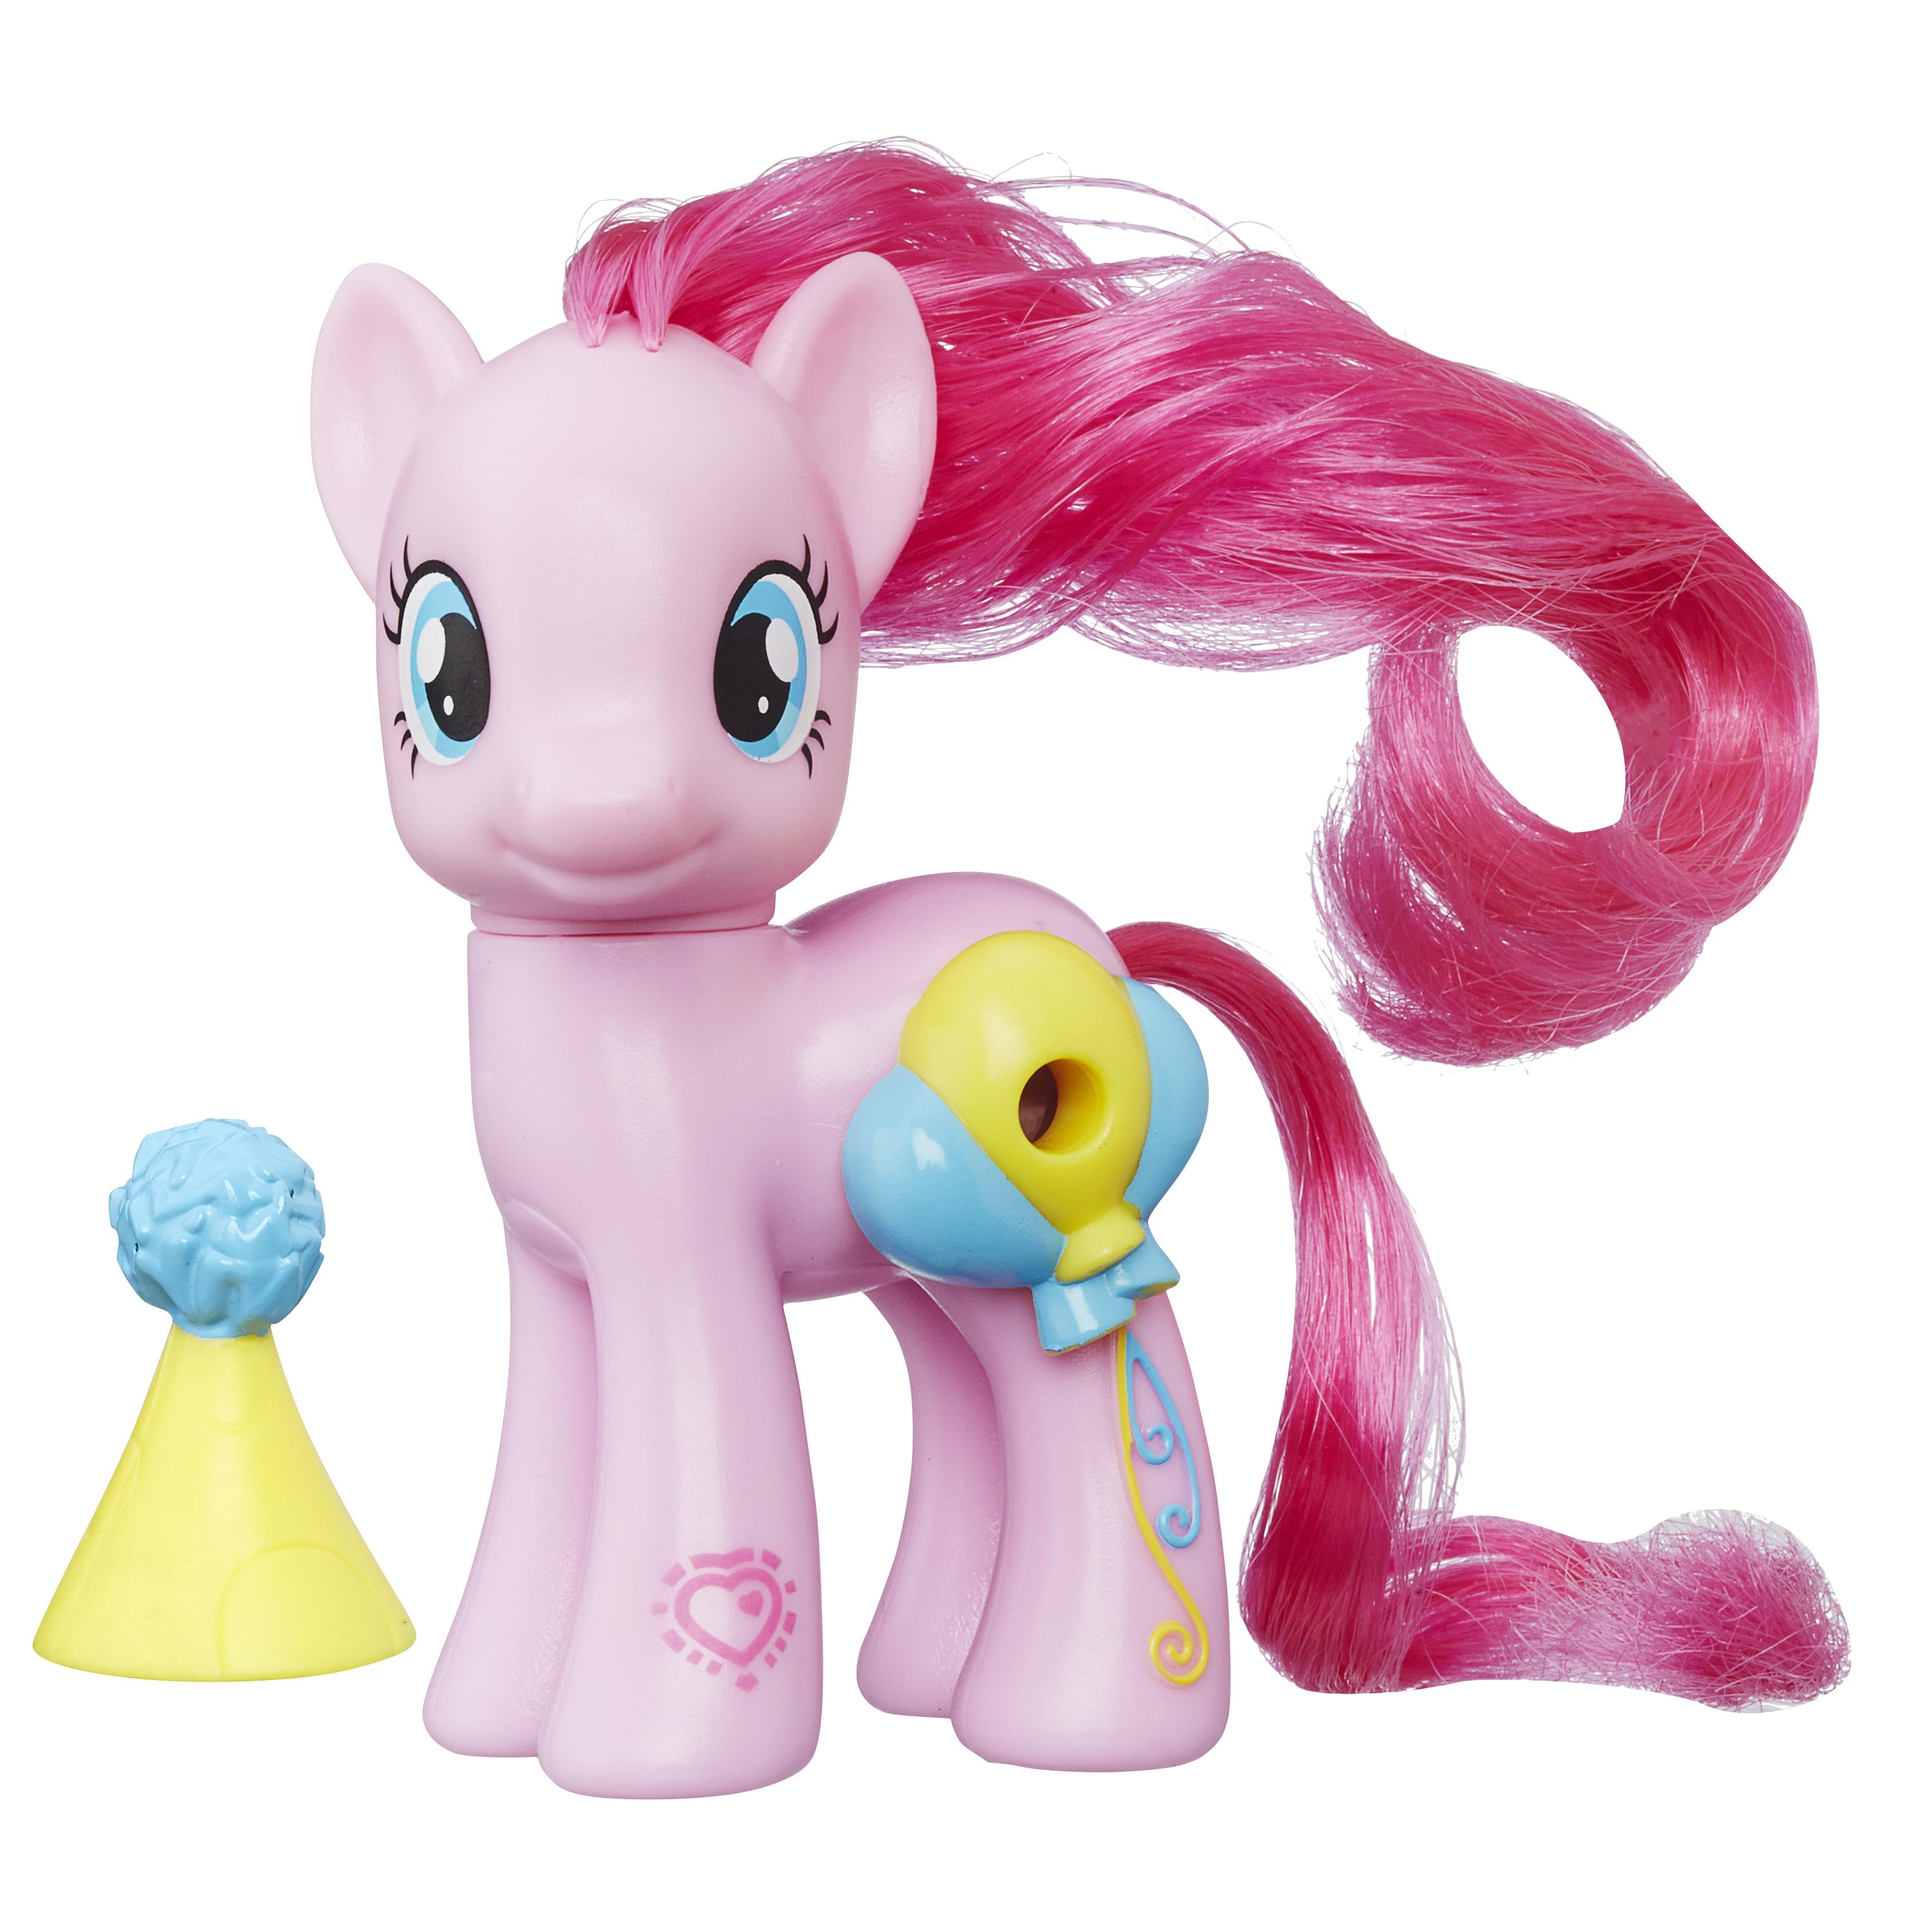 My Little Pony My Little Pony Фигурка My Little Pony «Пони с волшебной картинкой» в ассортименте my little pony фигурка shining friends c3329